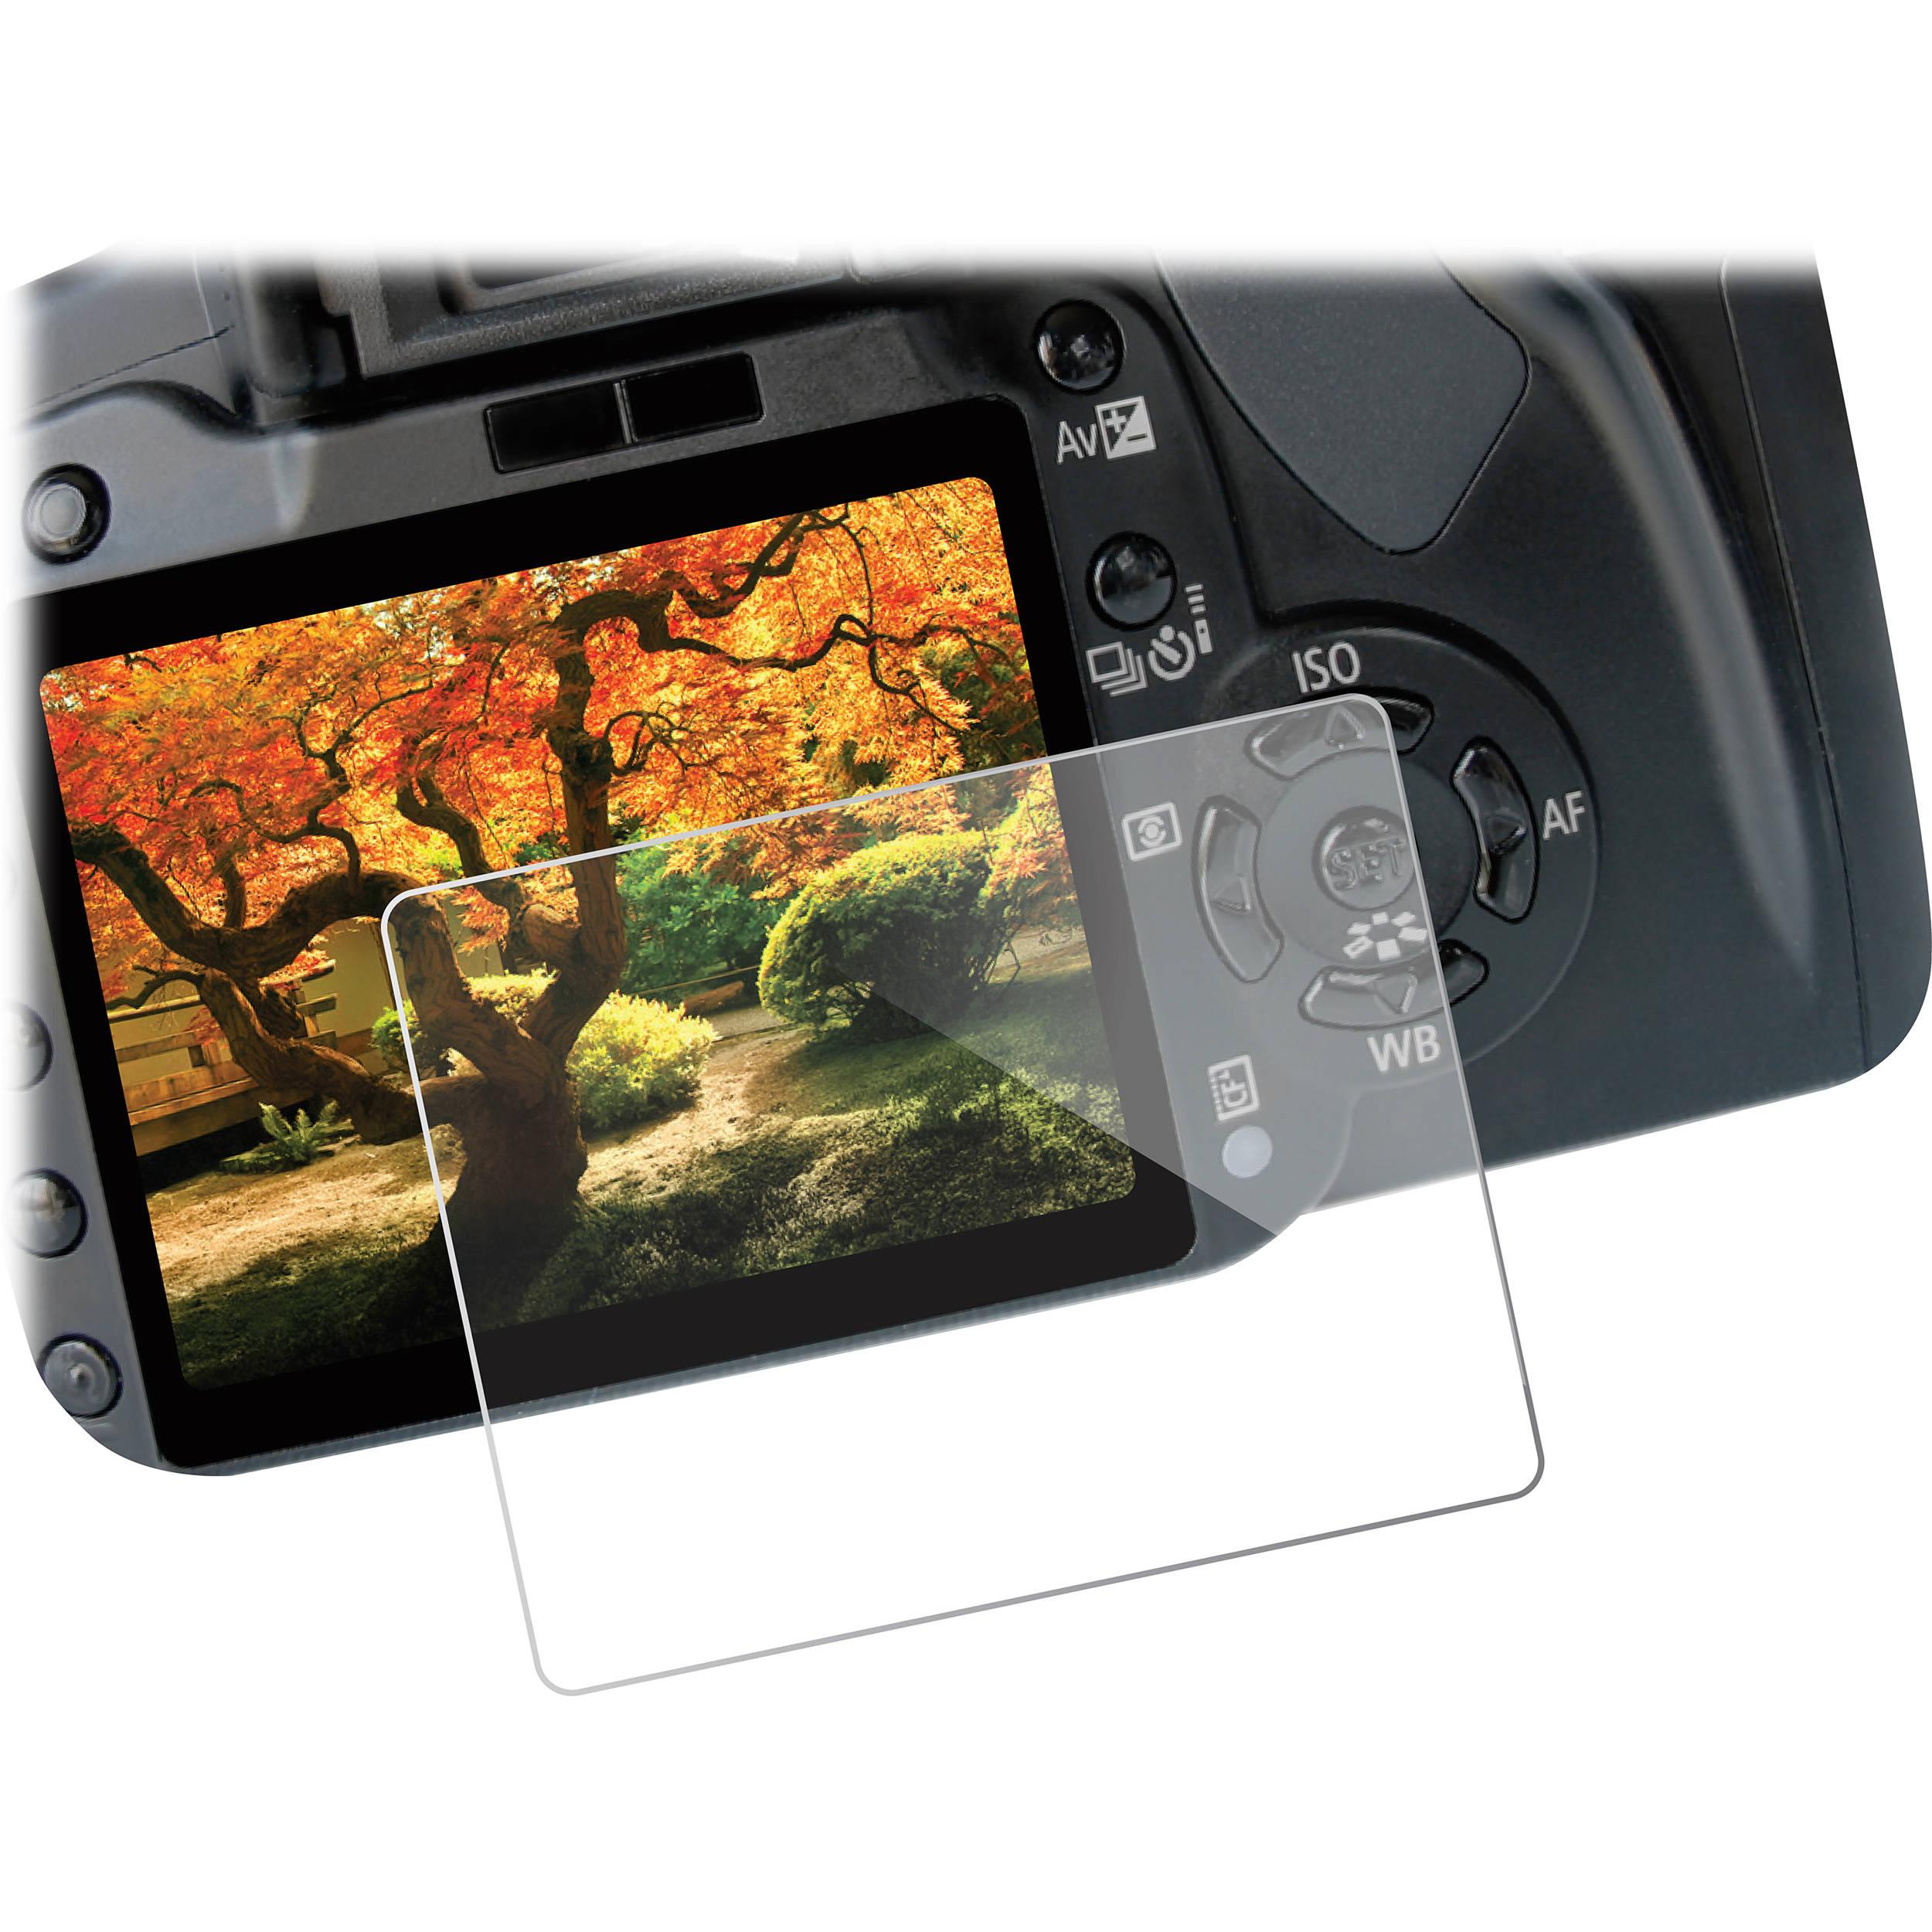 Screen Protectors Compatible Nikon D7500 AFUNTA 2 Packs Anti-Scratch Tempered Glass Protective Films for DSLR Digital Camera